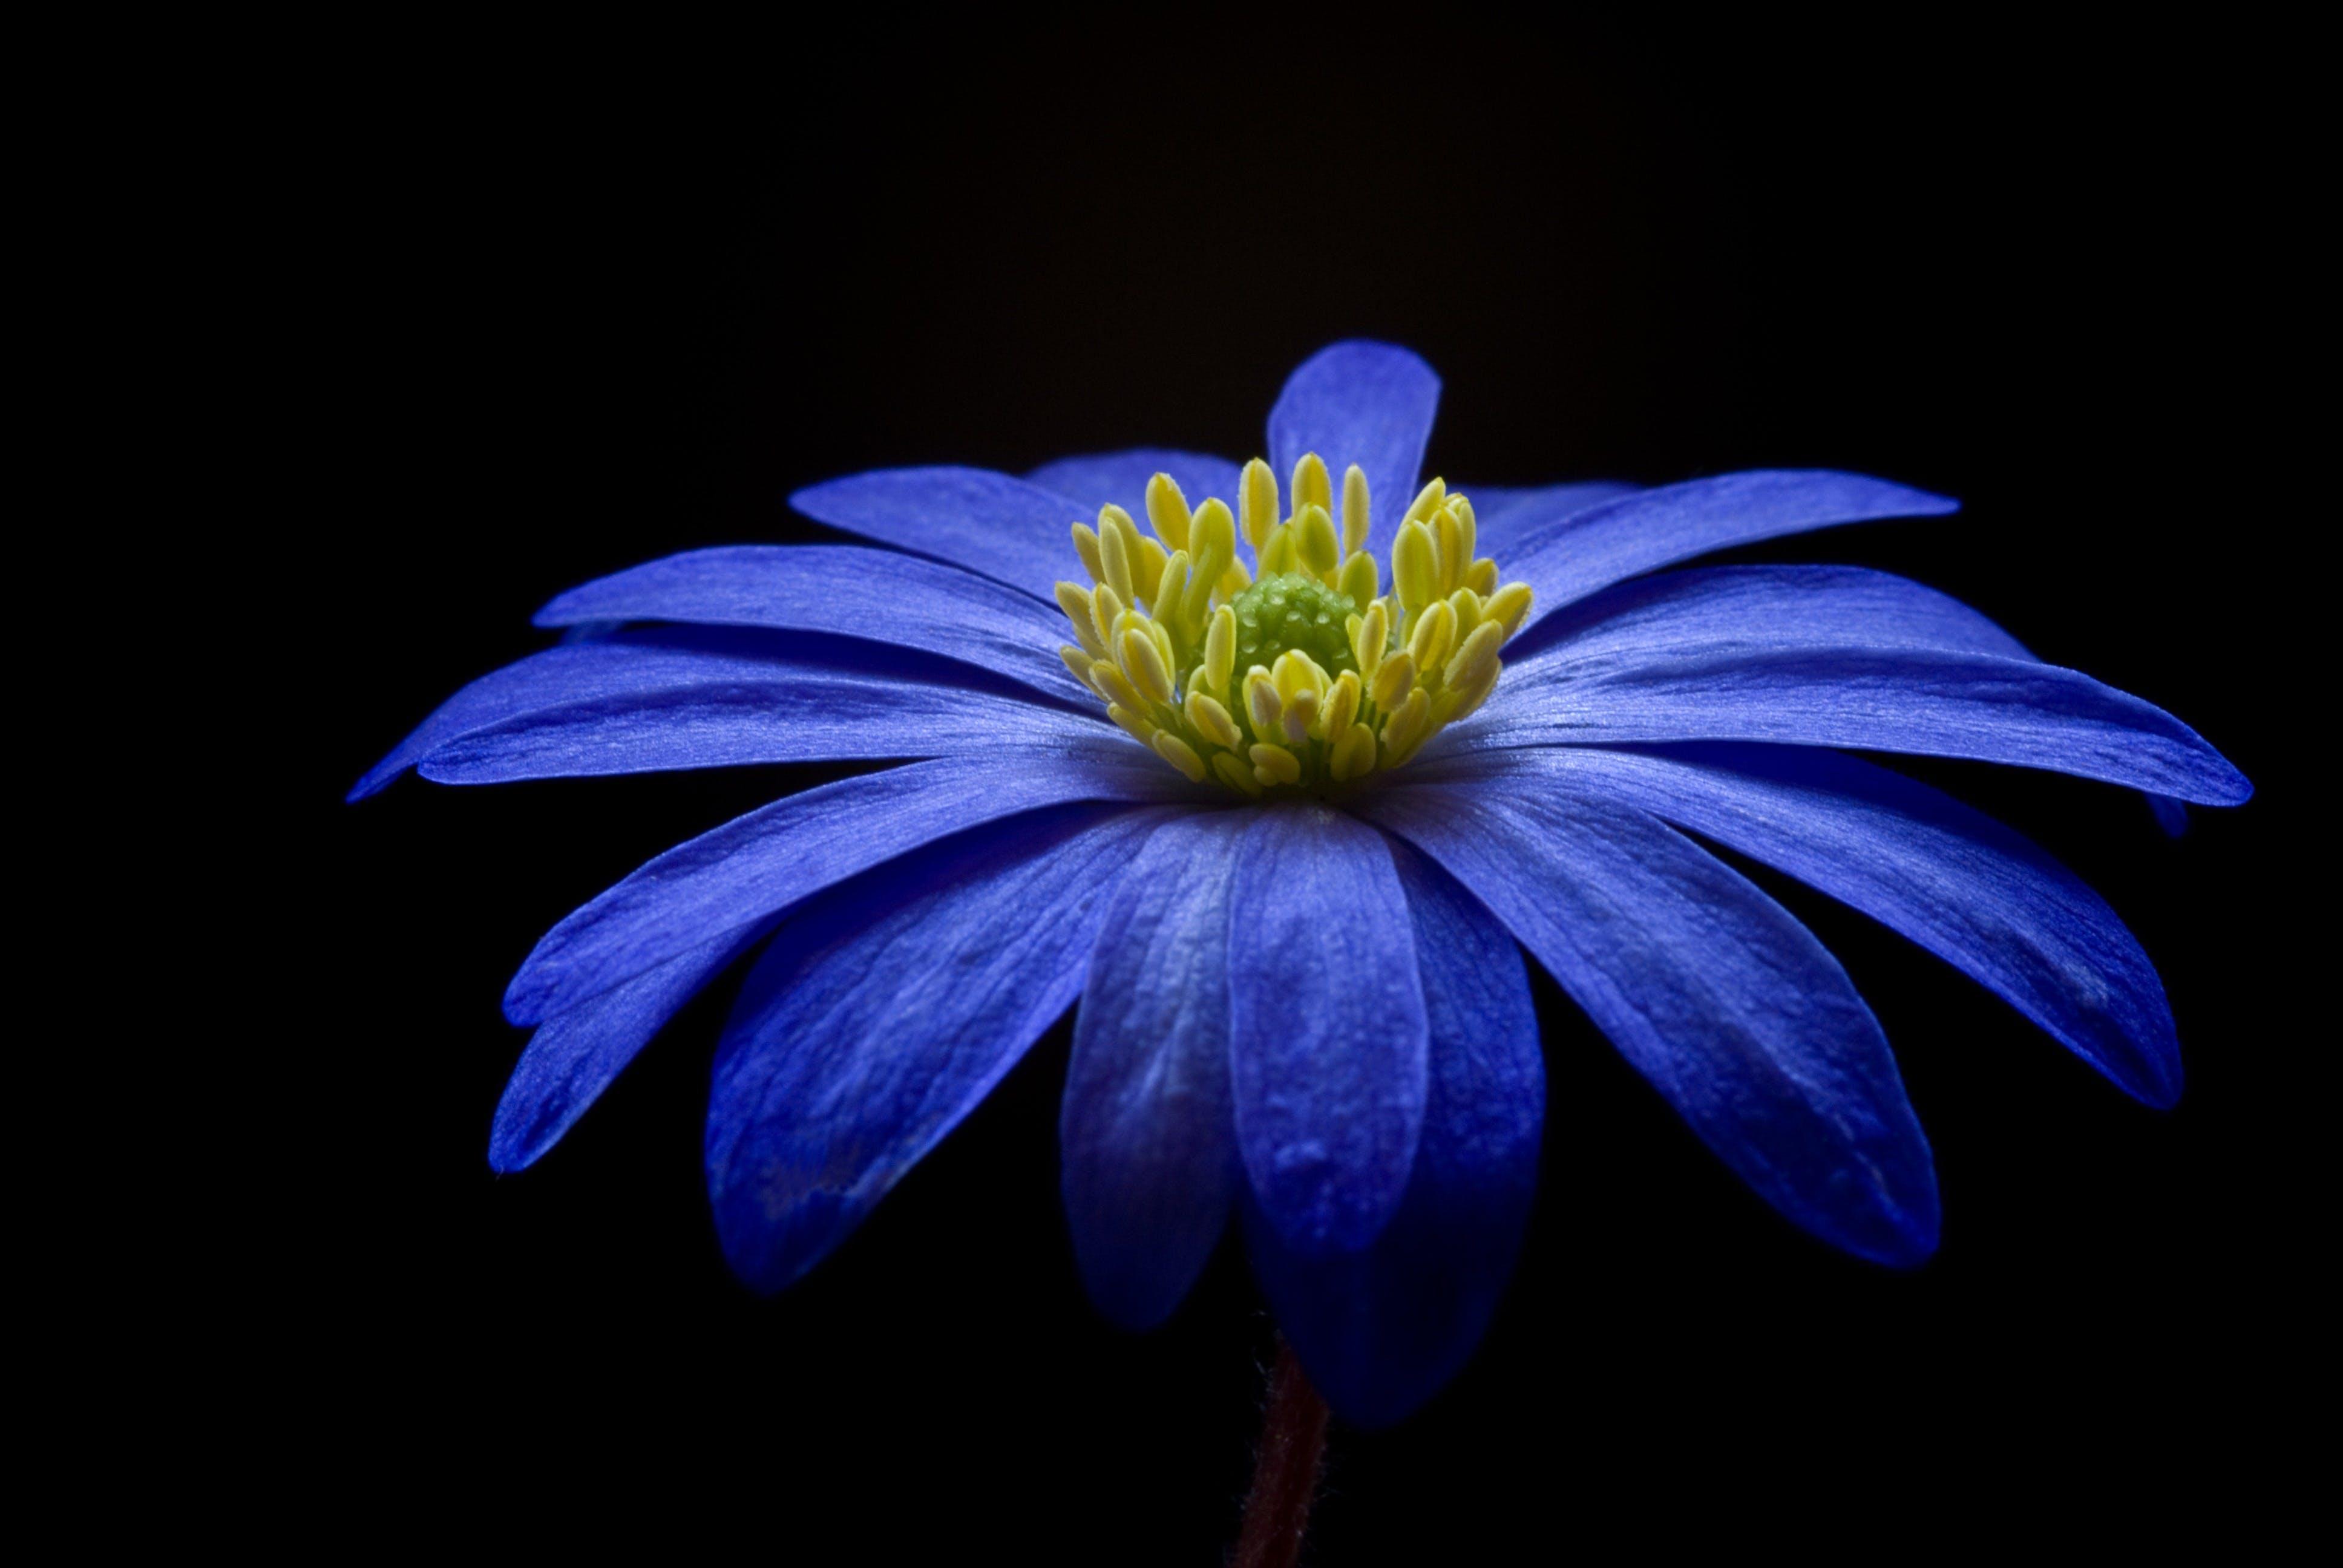 Blue Yellow Petaled Flower